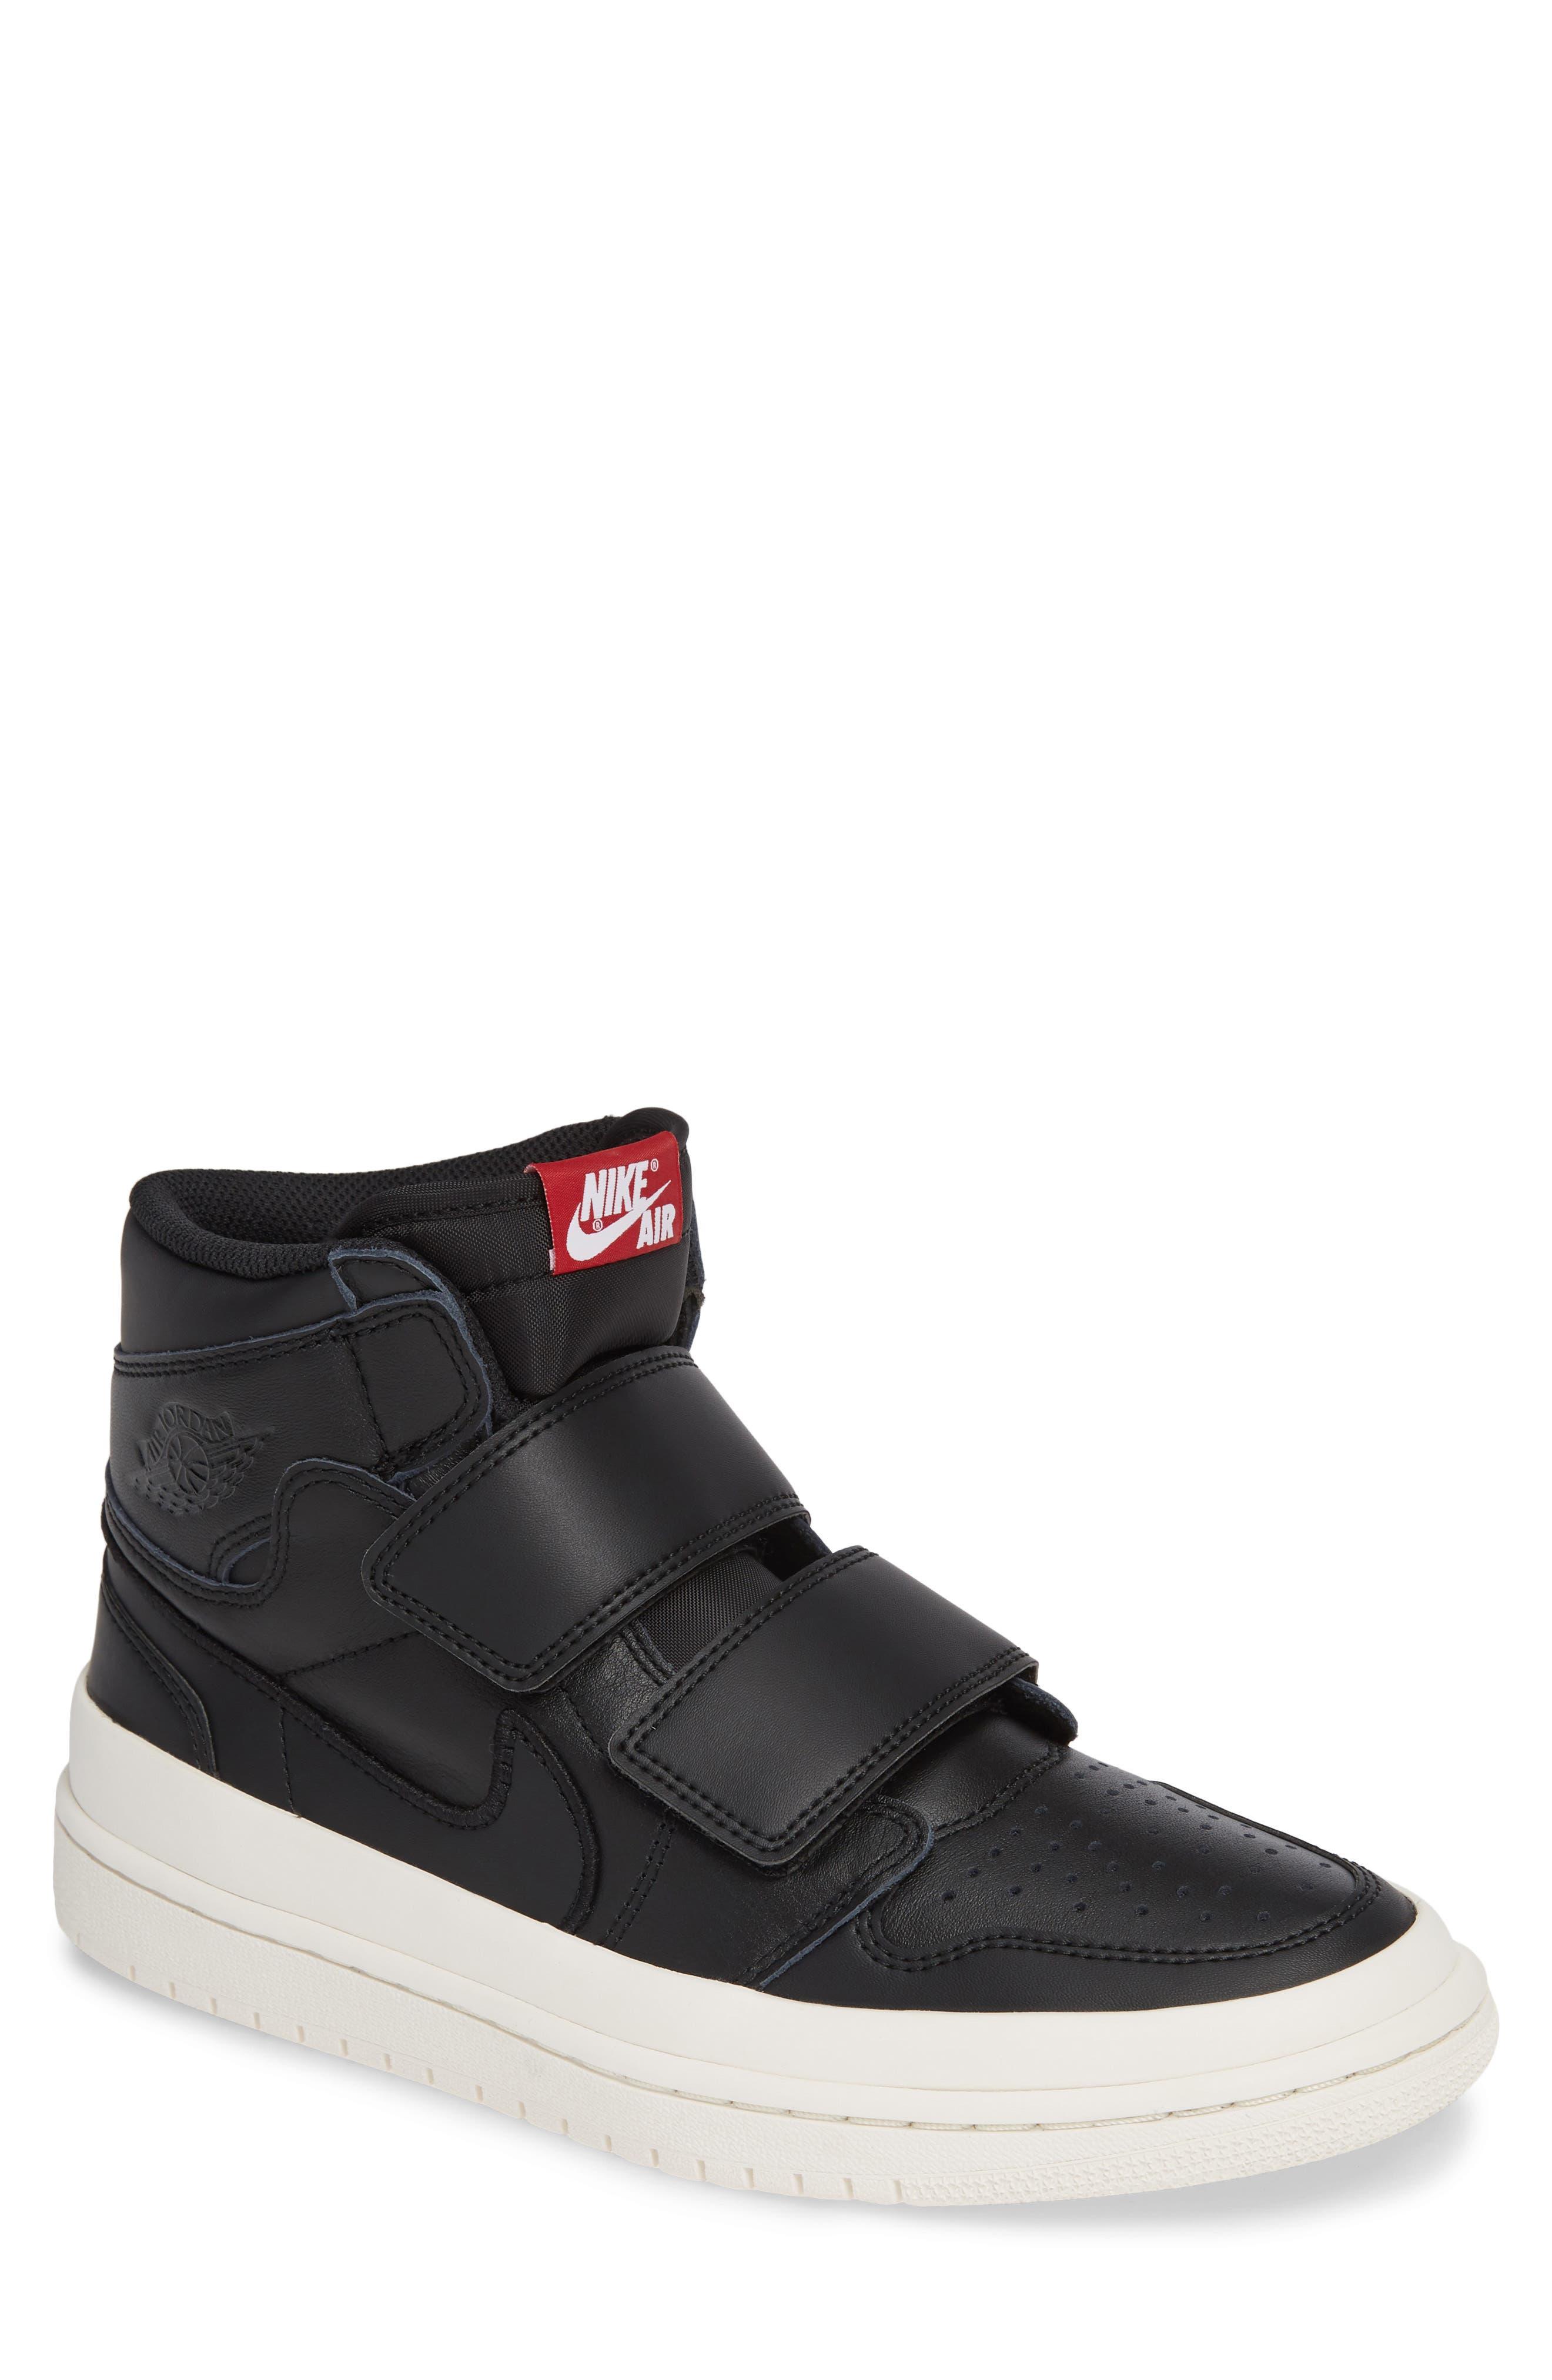 Air Jordan 1 Retro High Double Strap Sneaker,                         Main,                         color, BLACK/ GYM RED